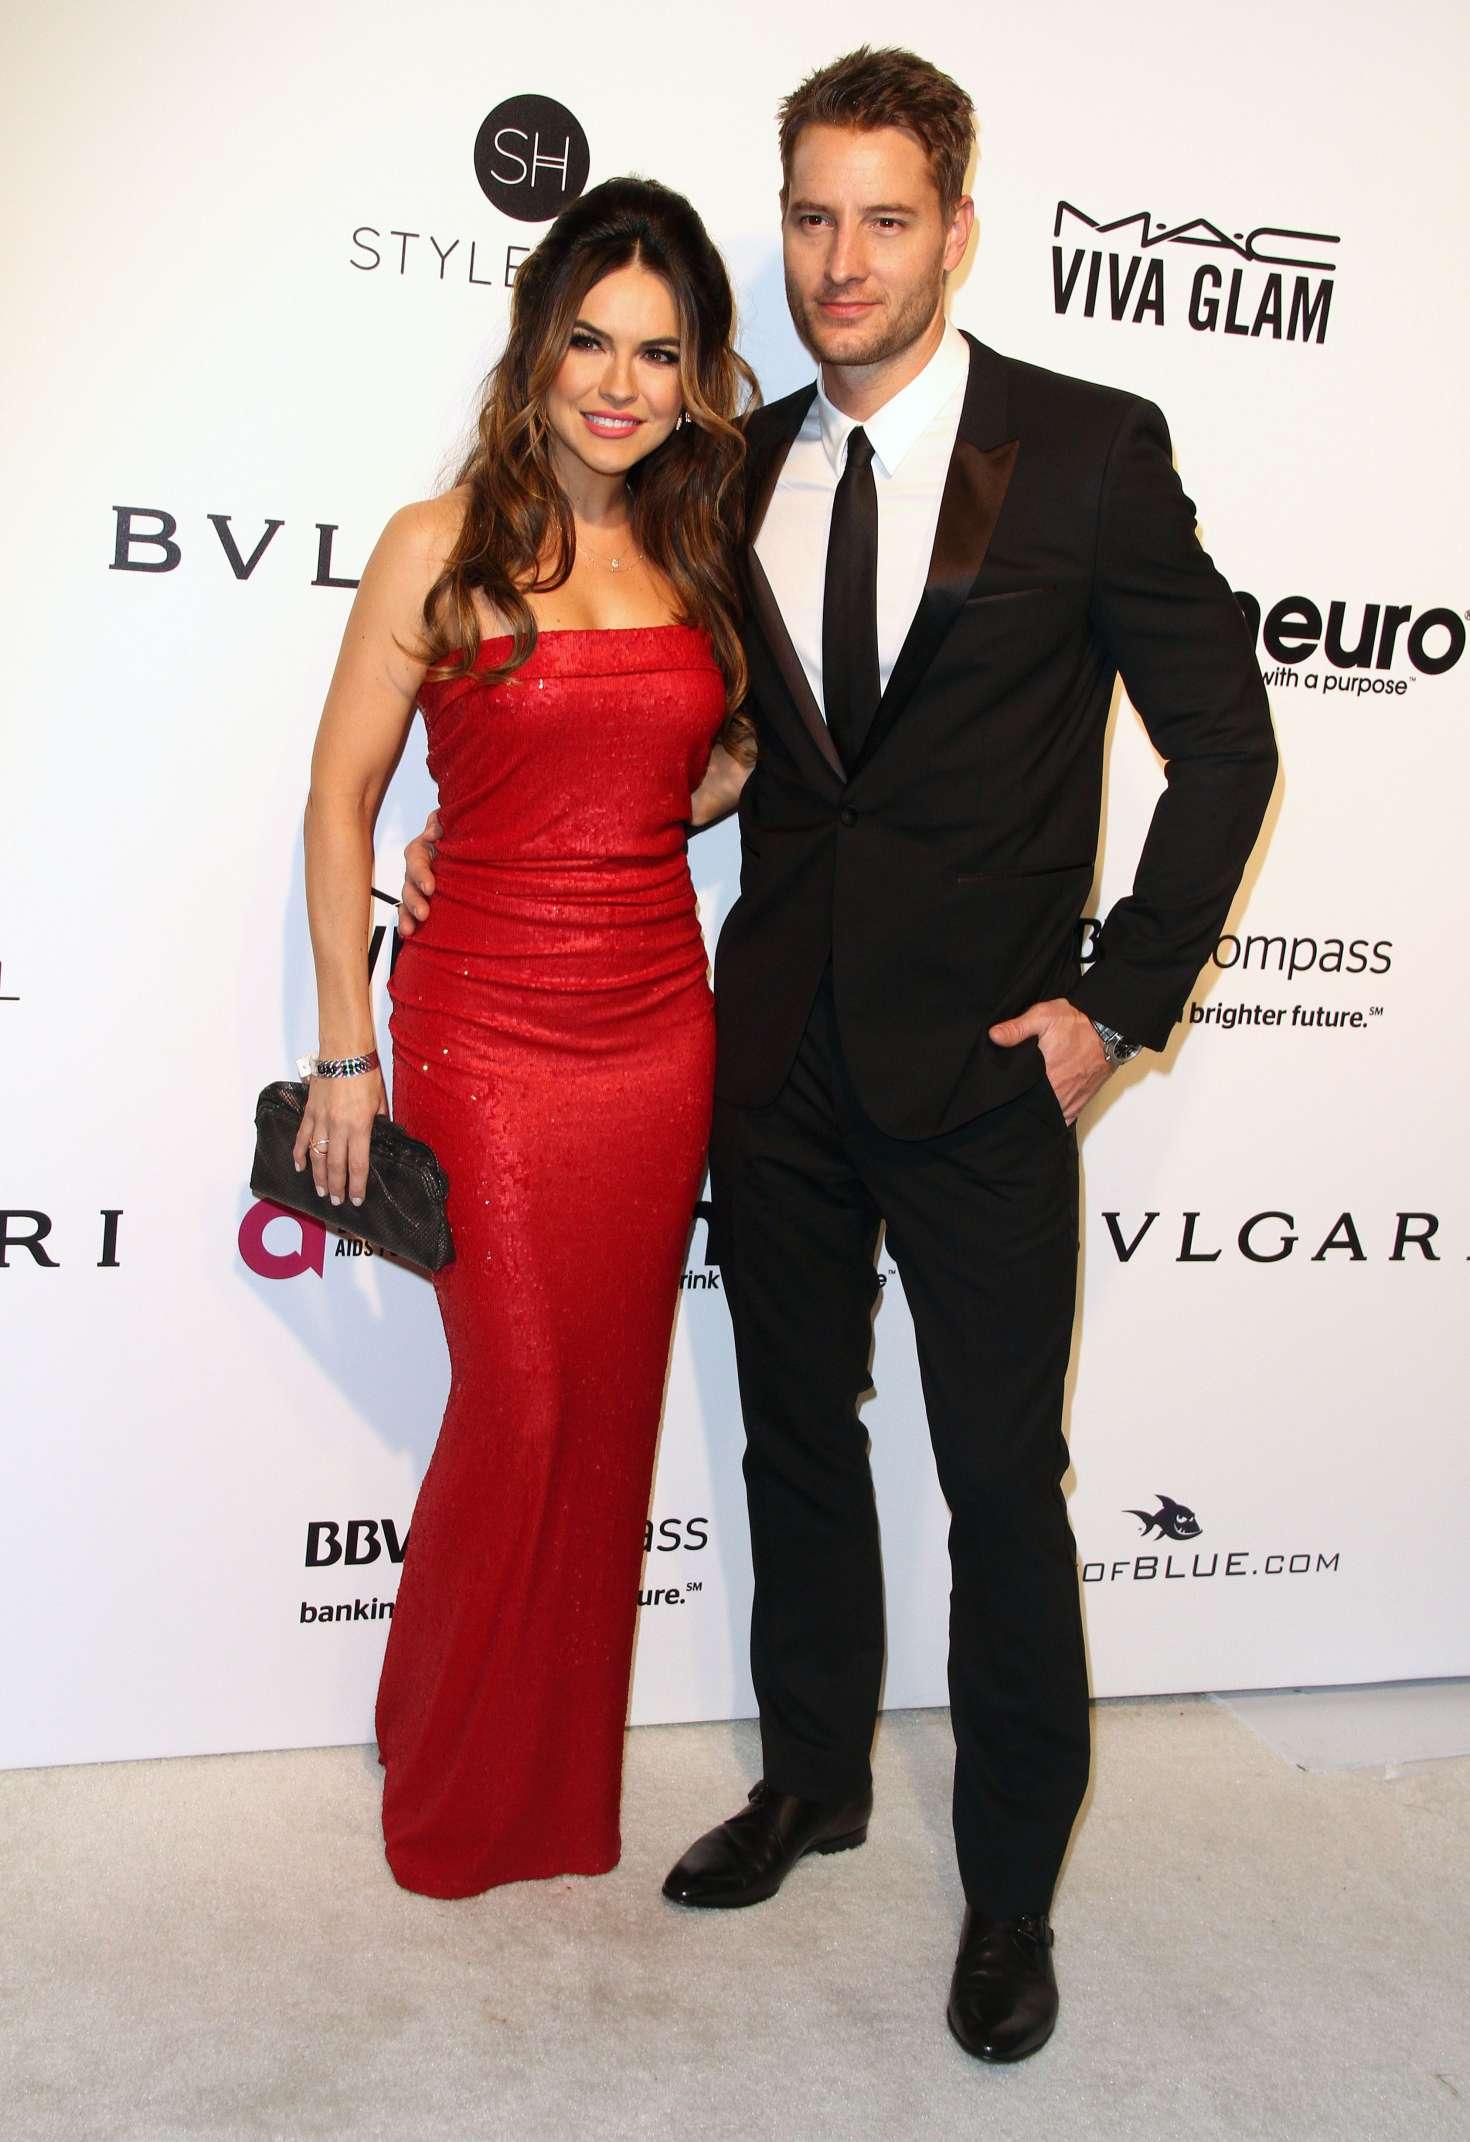 Chrishell Stause 2017 : Chrishell Stause: 2017 Elton John AIDS Foundations Oscar Viewing Party -05